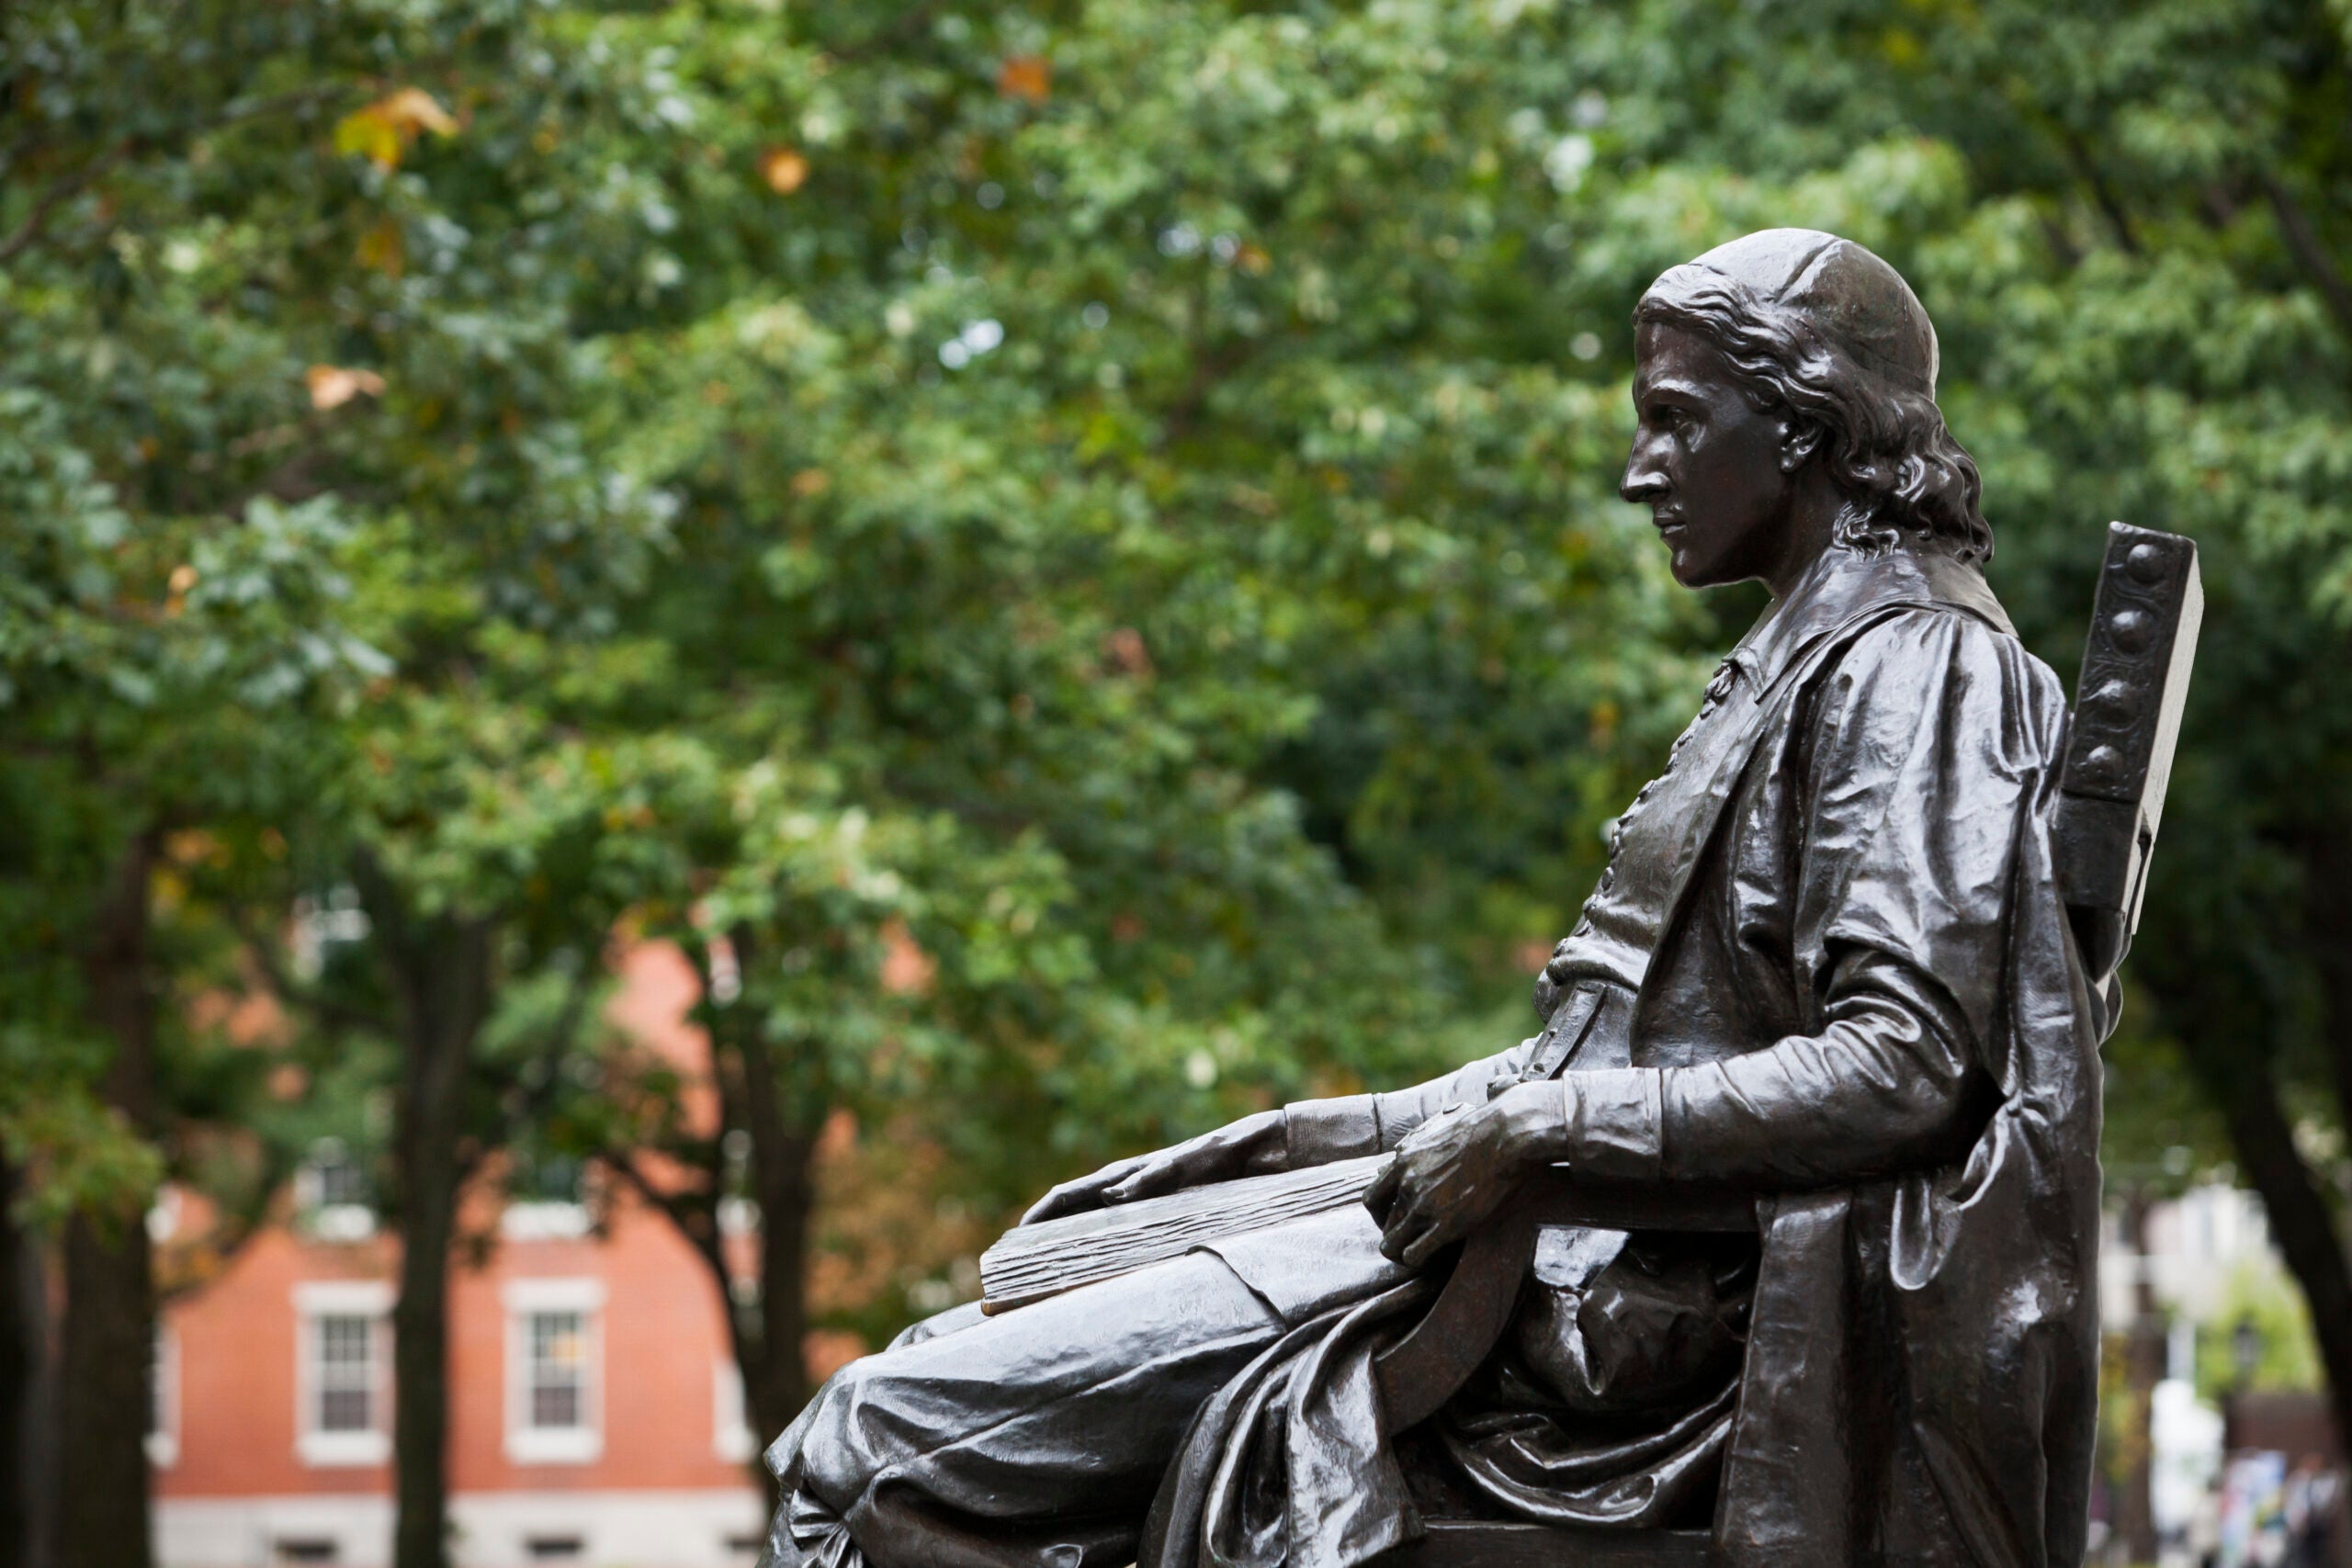 The John Harvard statue